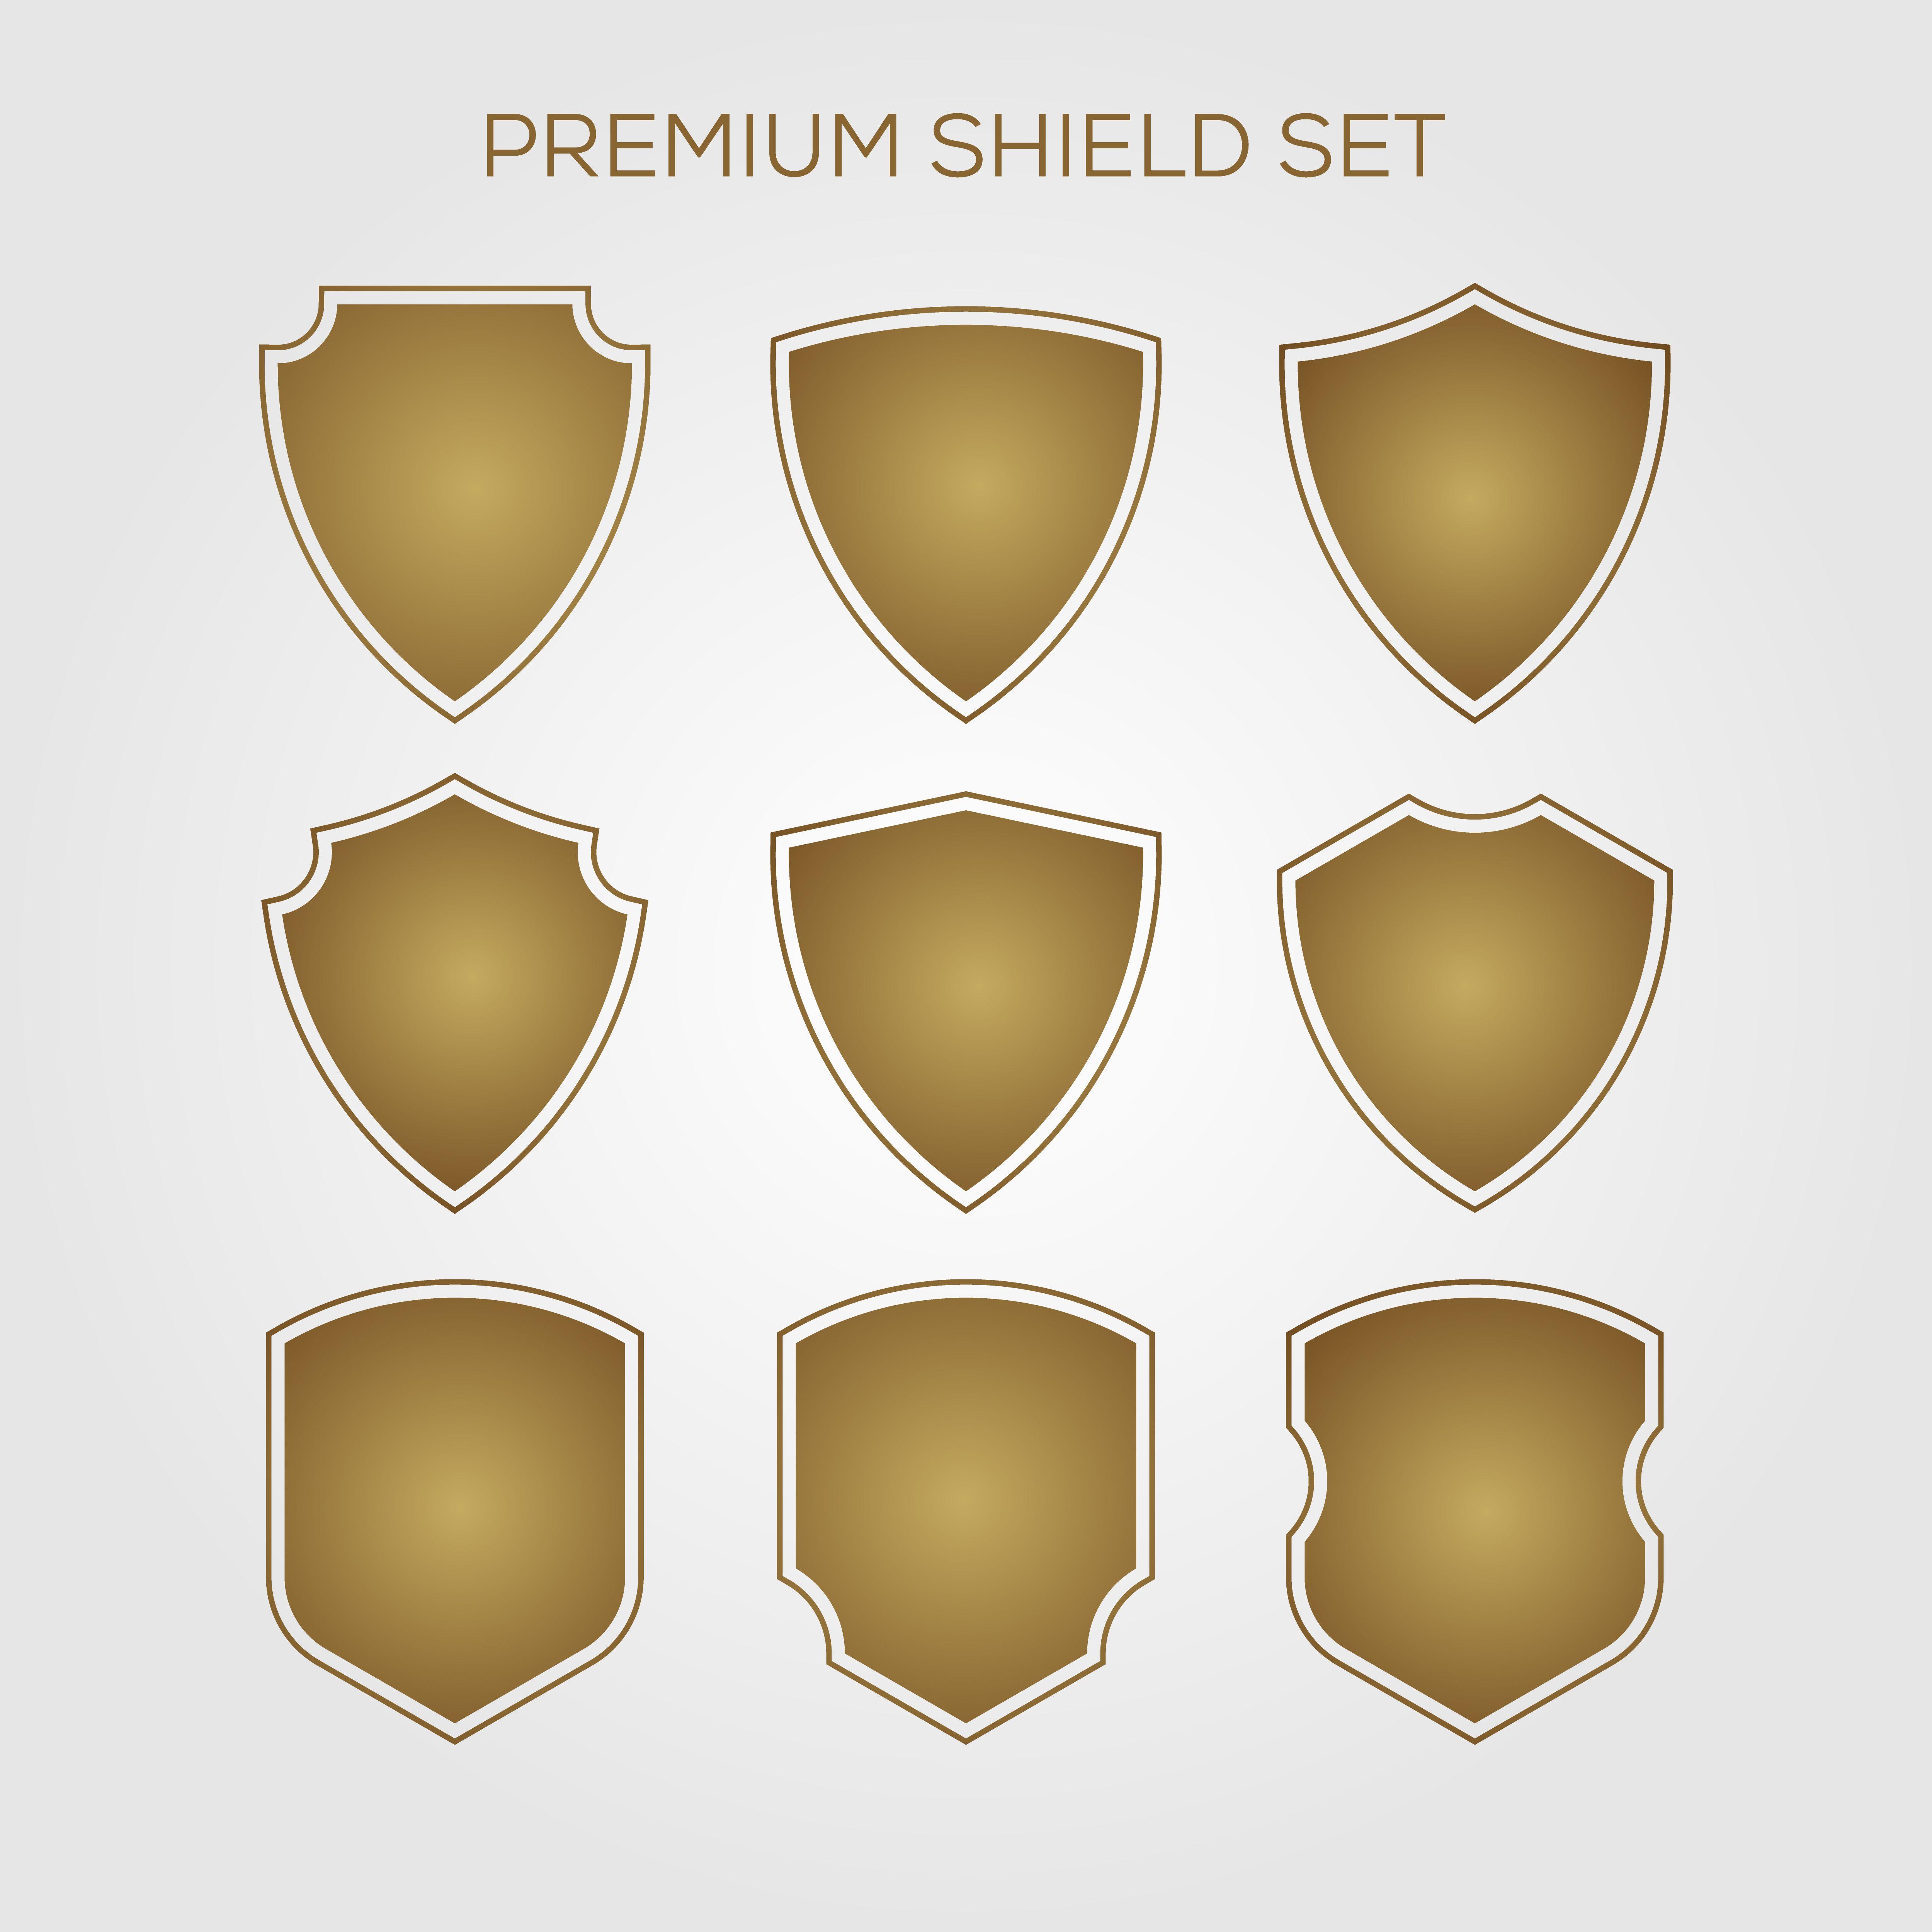 gold, shield, set, geometric, premium, logo, vector, icon